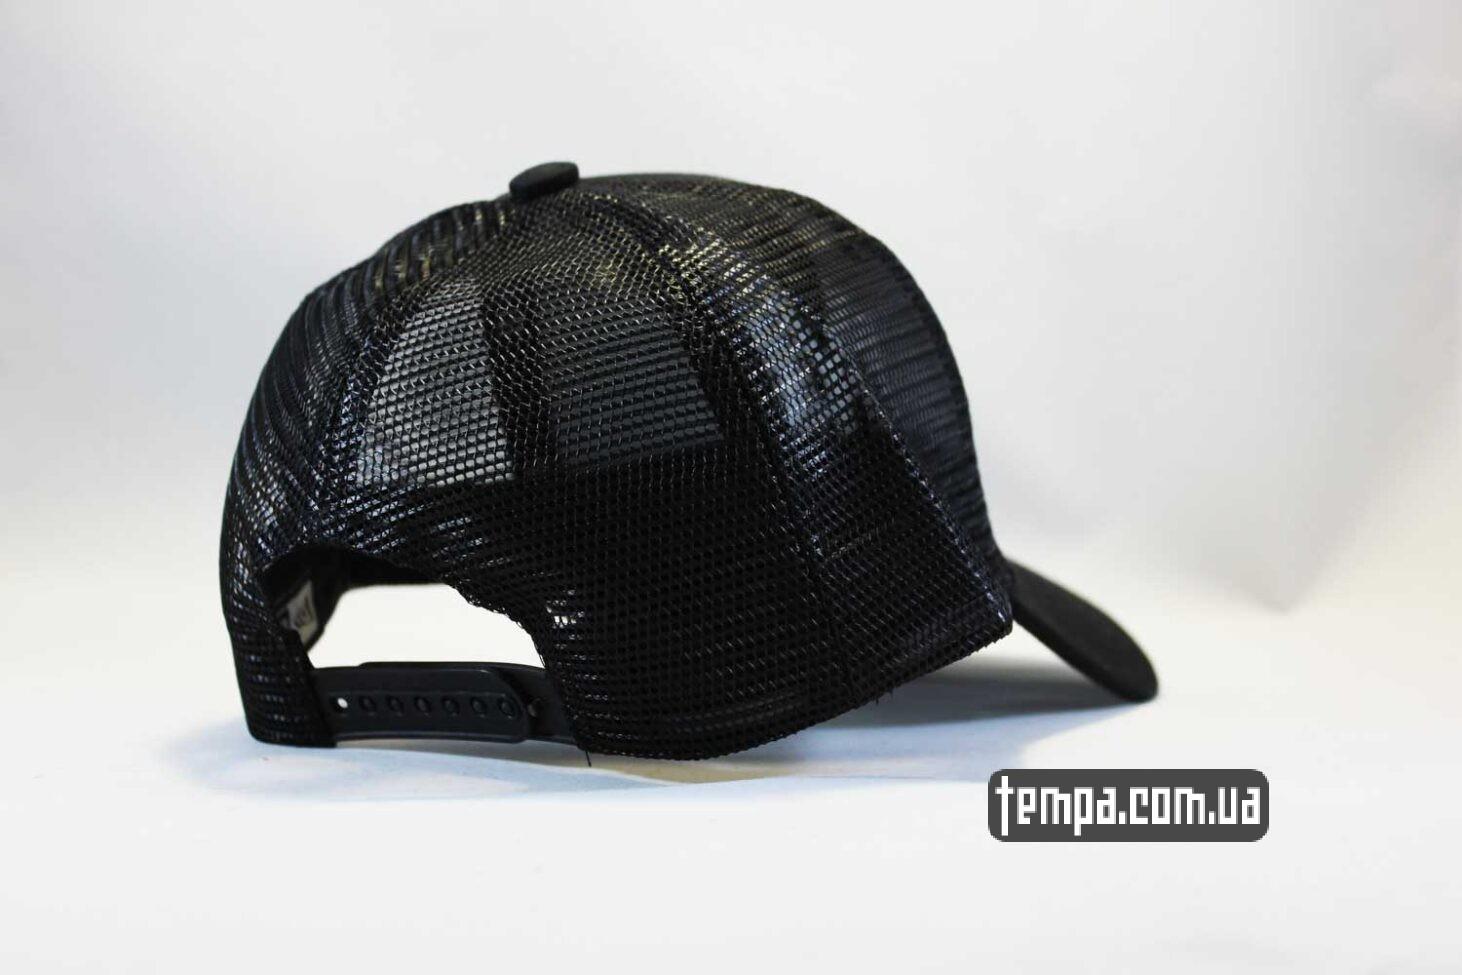 такер с сеткой кепка бейсболка Trucker NY New York Yankees черная сеточка